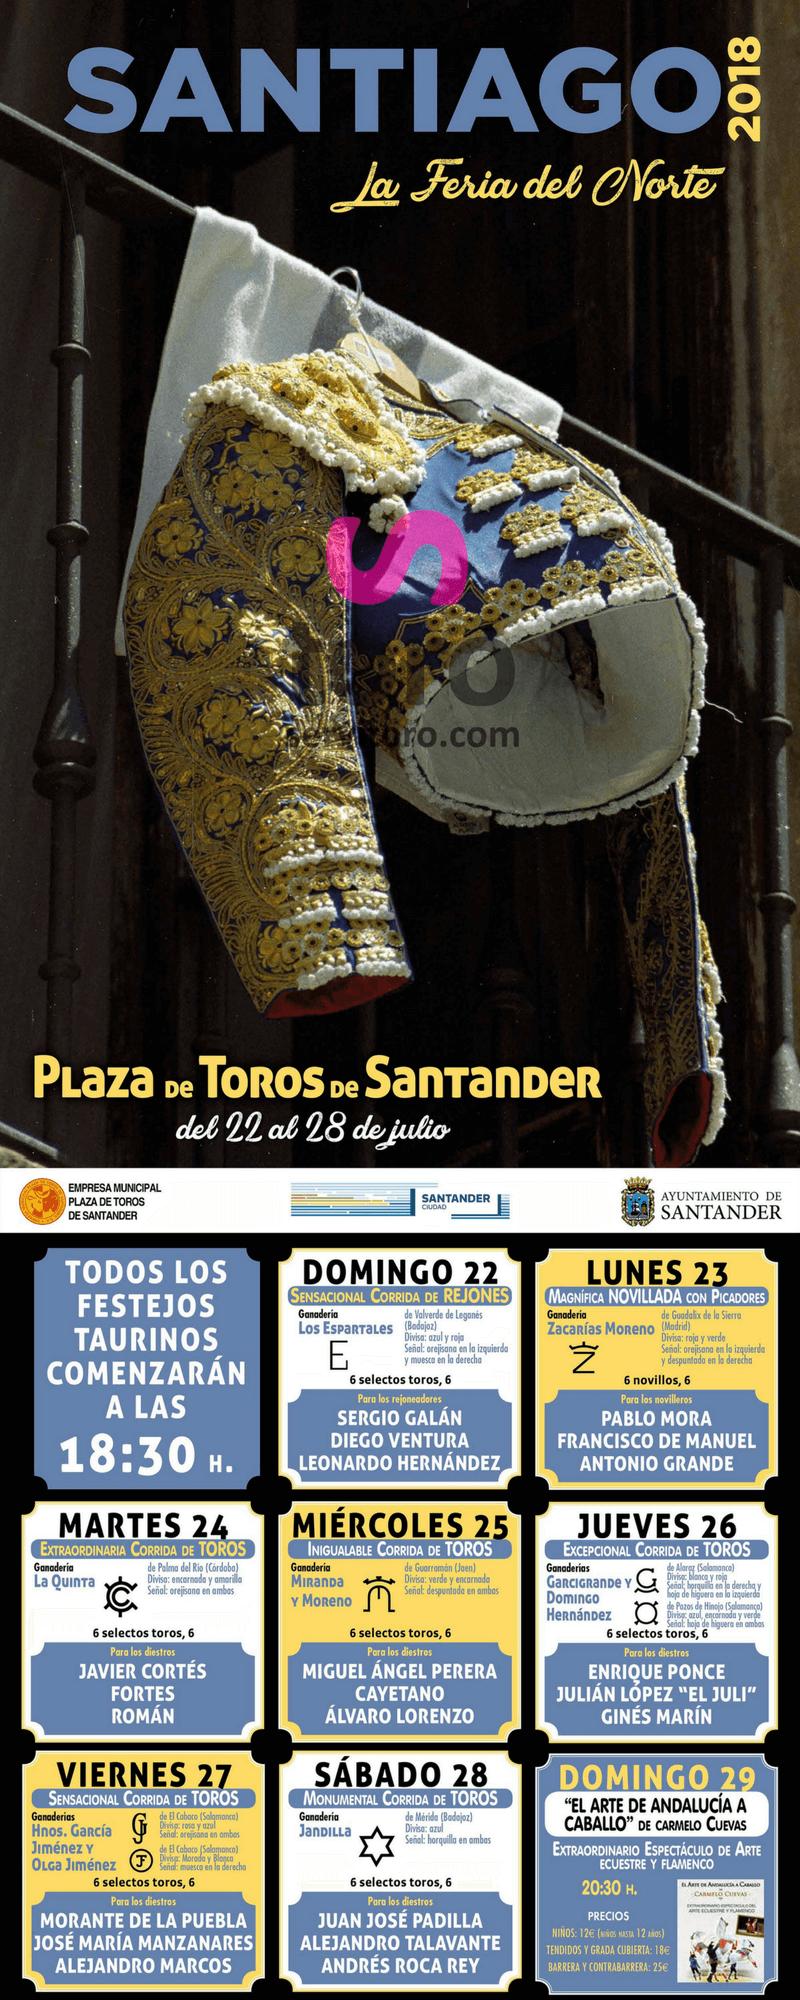 Fair of Santander